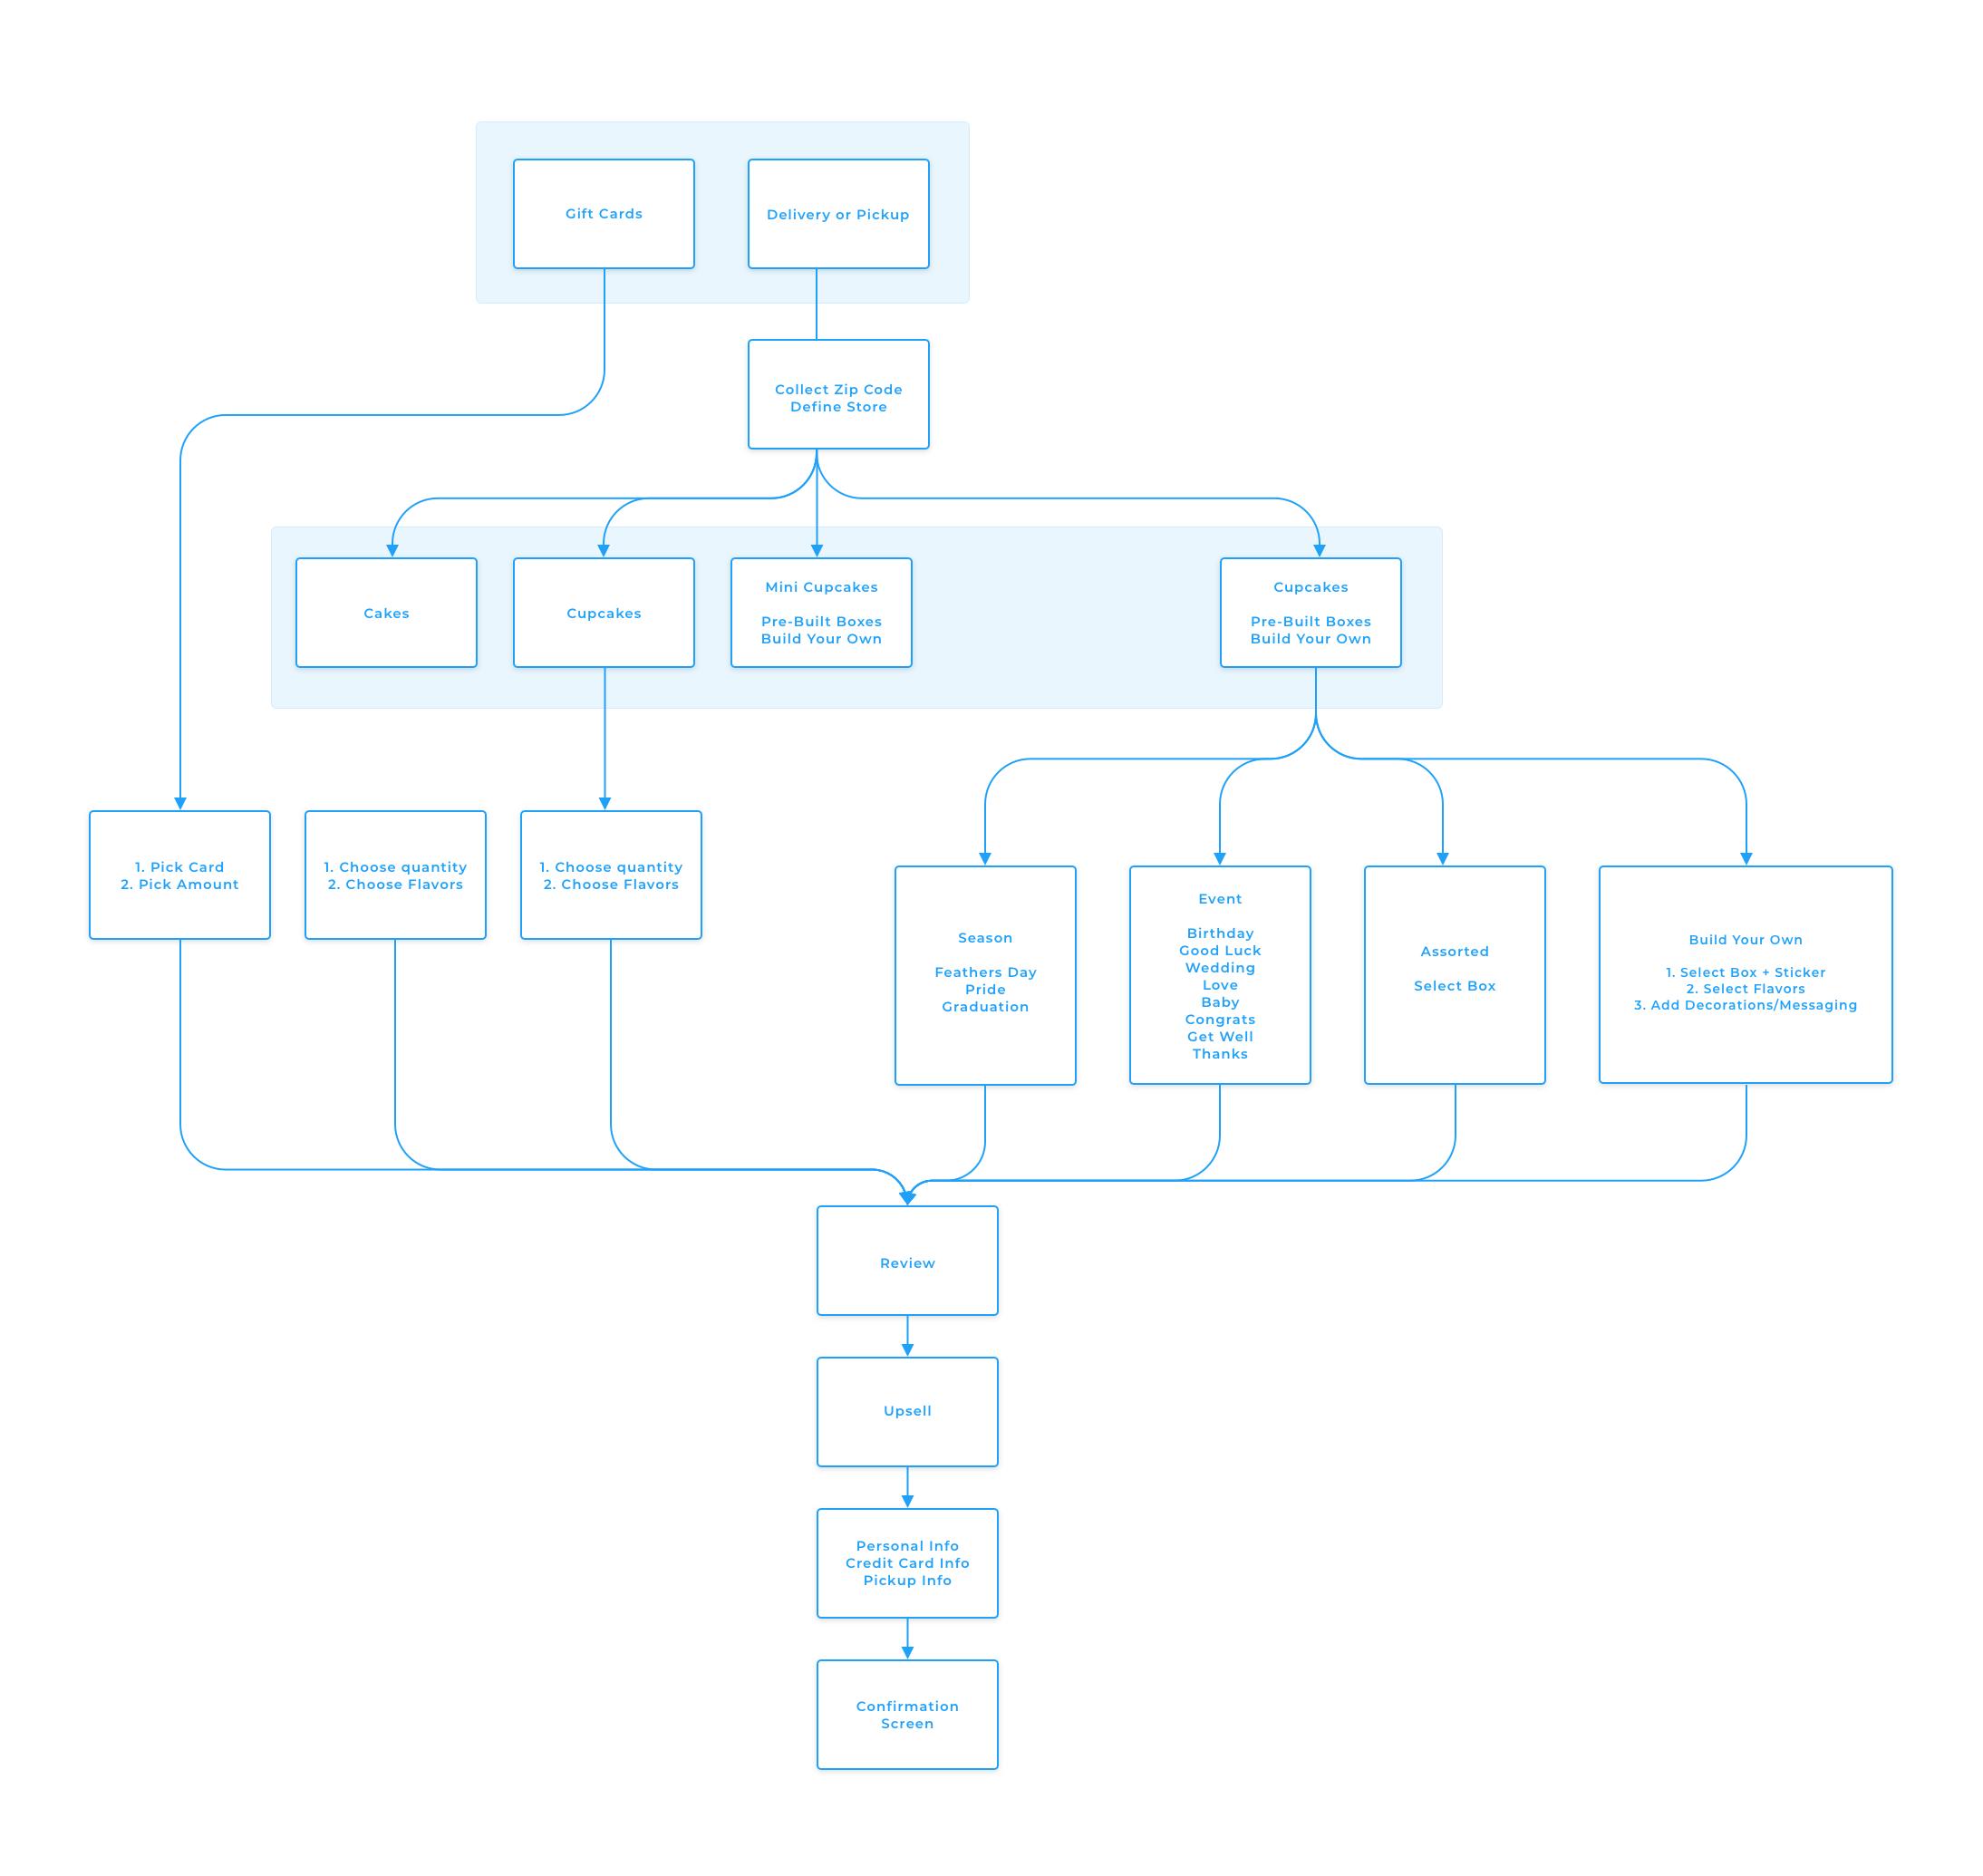 Sprinkles - Information Architecture Diagram